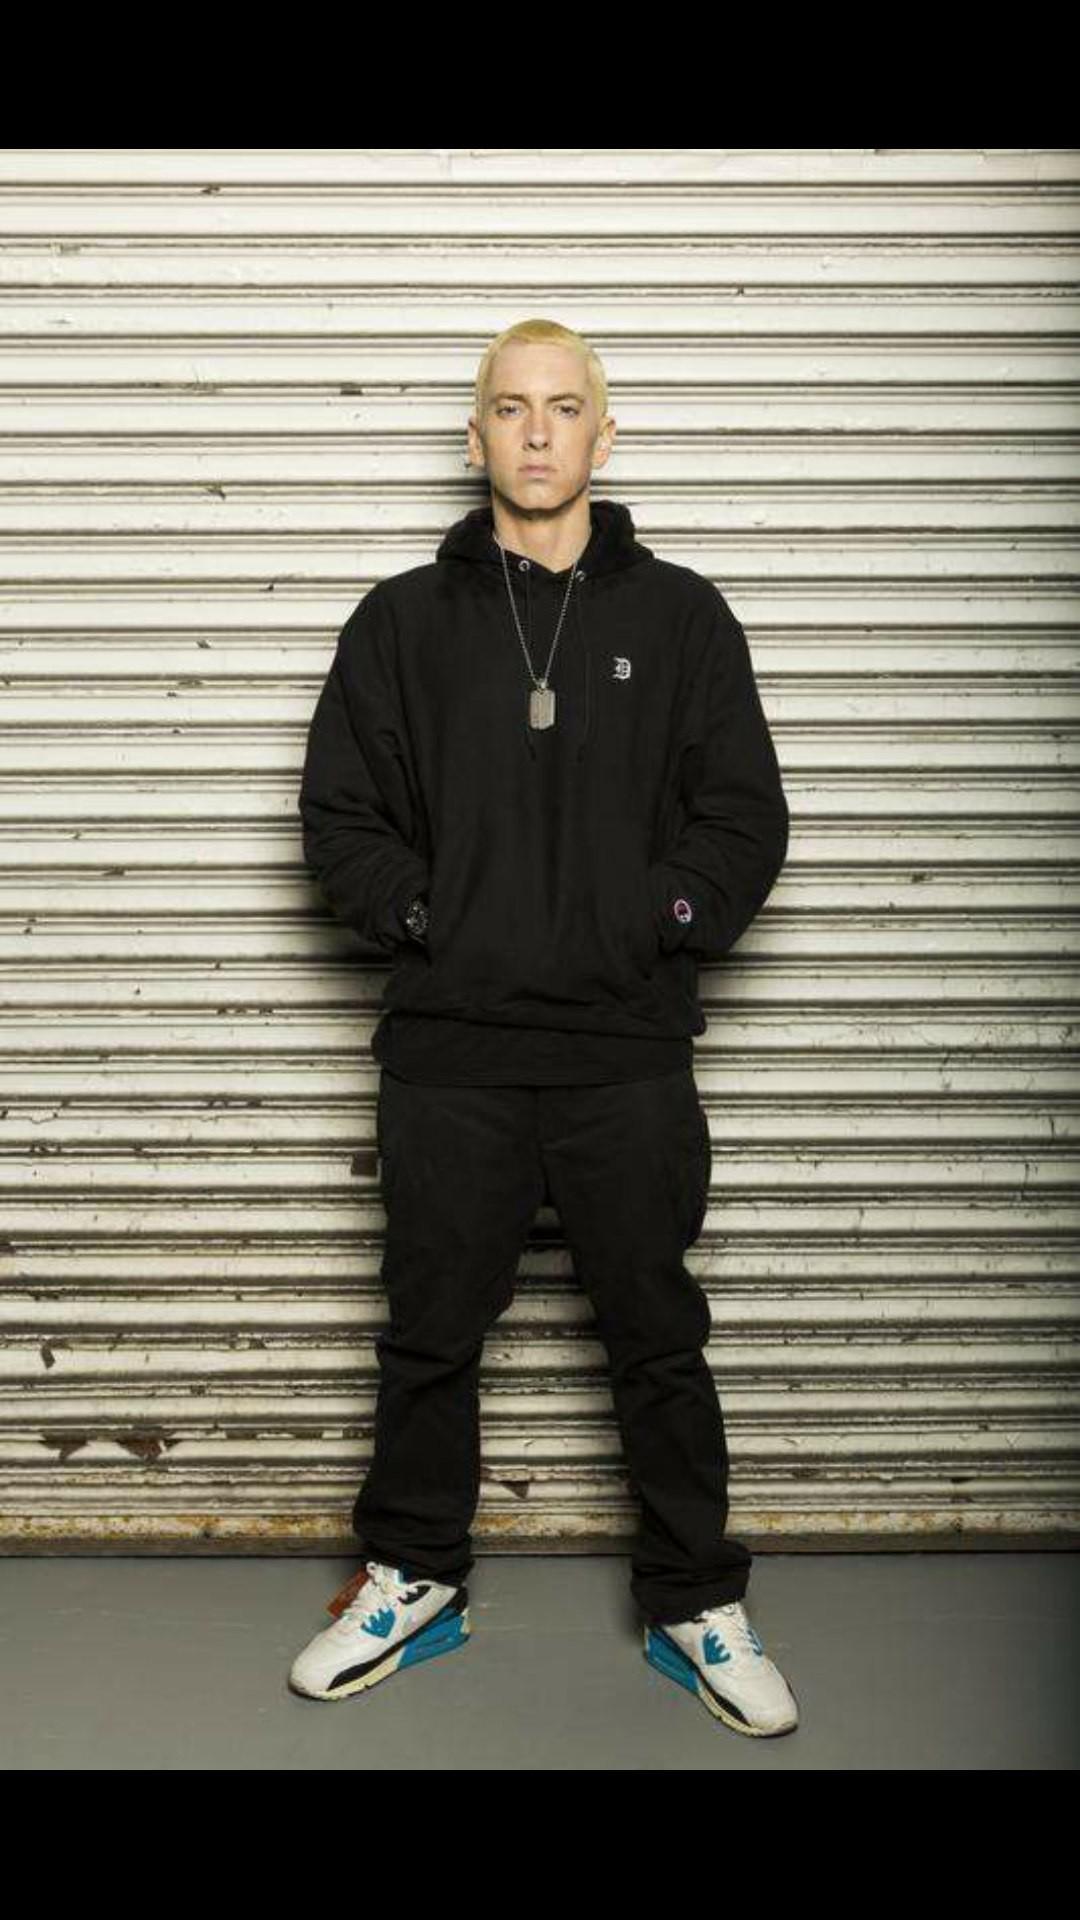 Eminem Phone Wallpaper ①